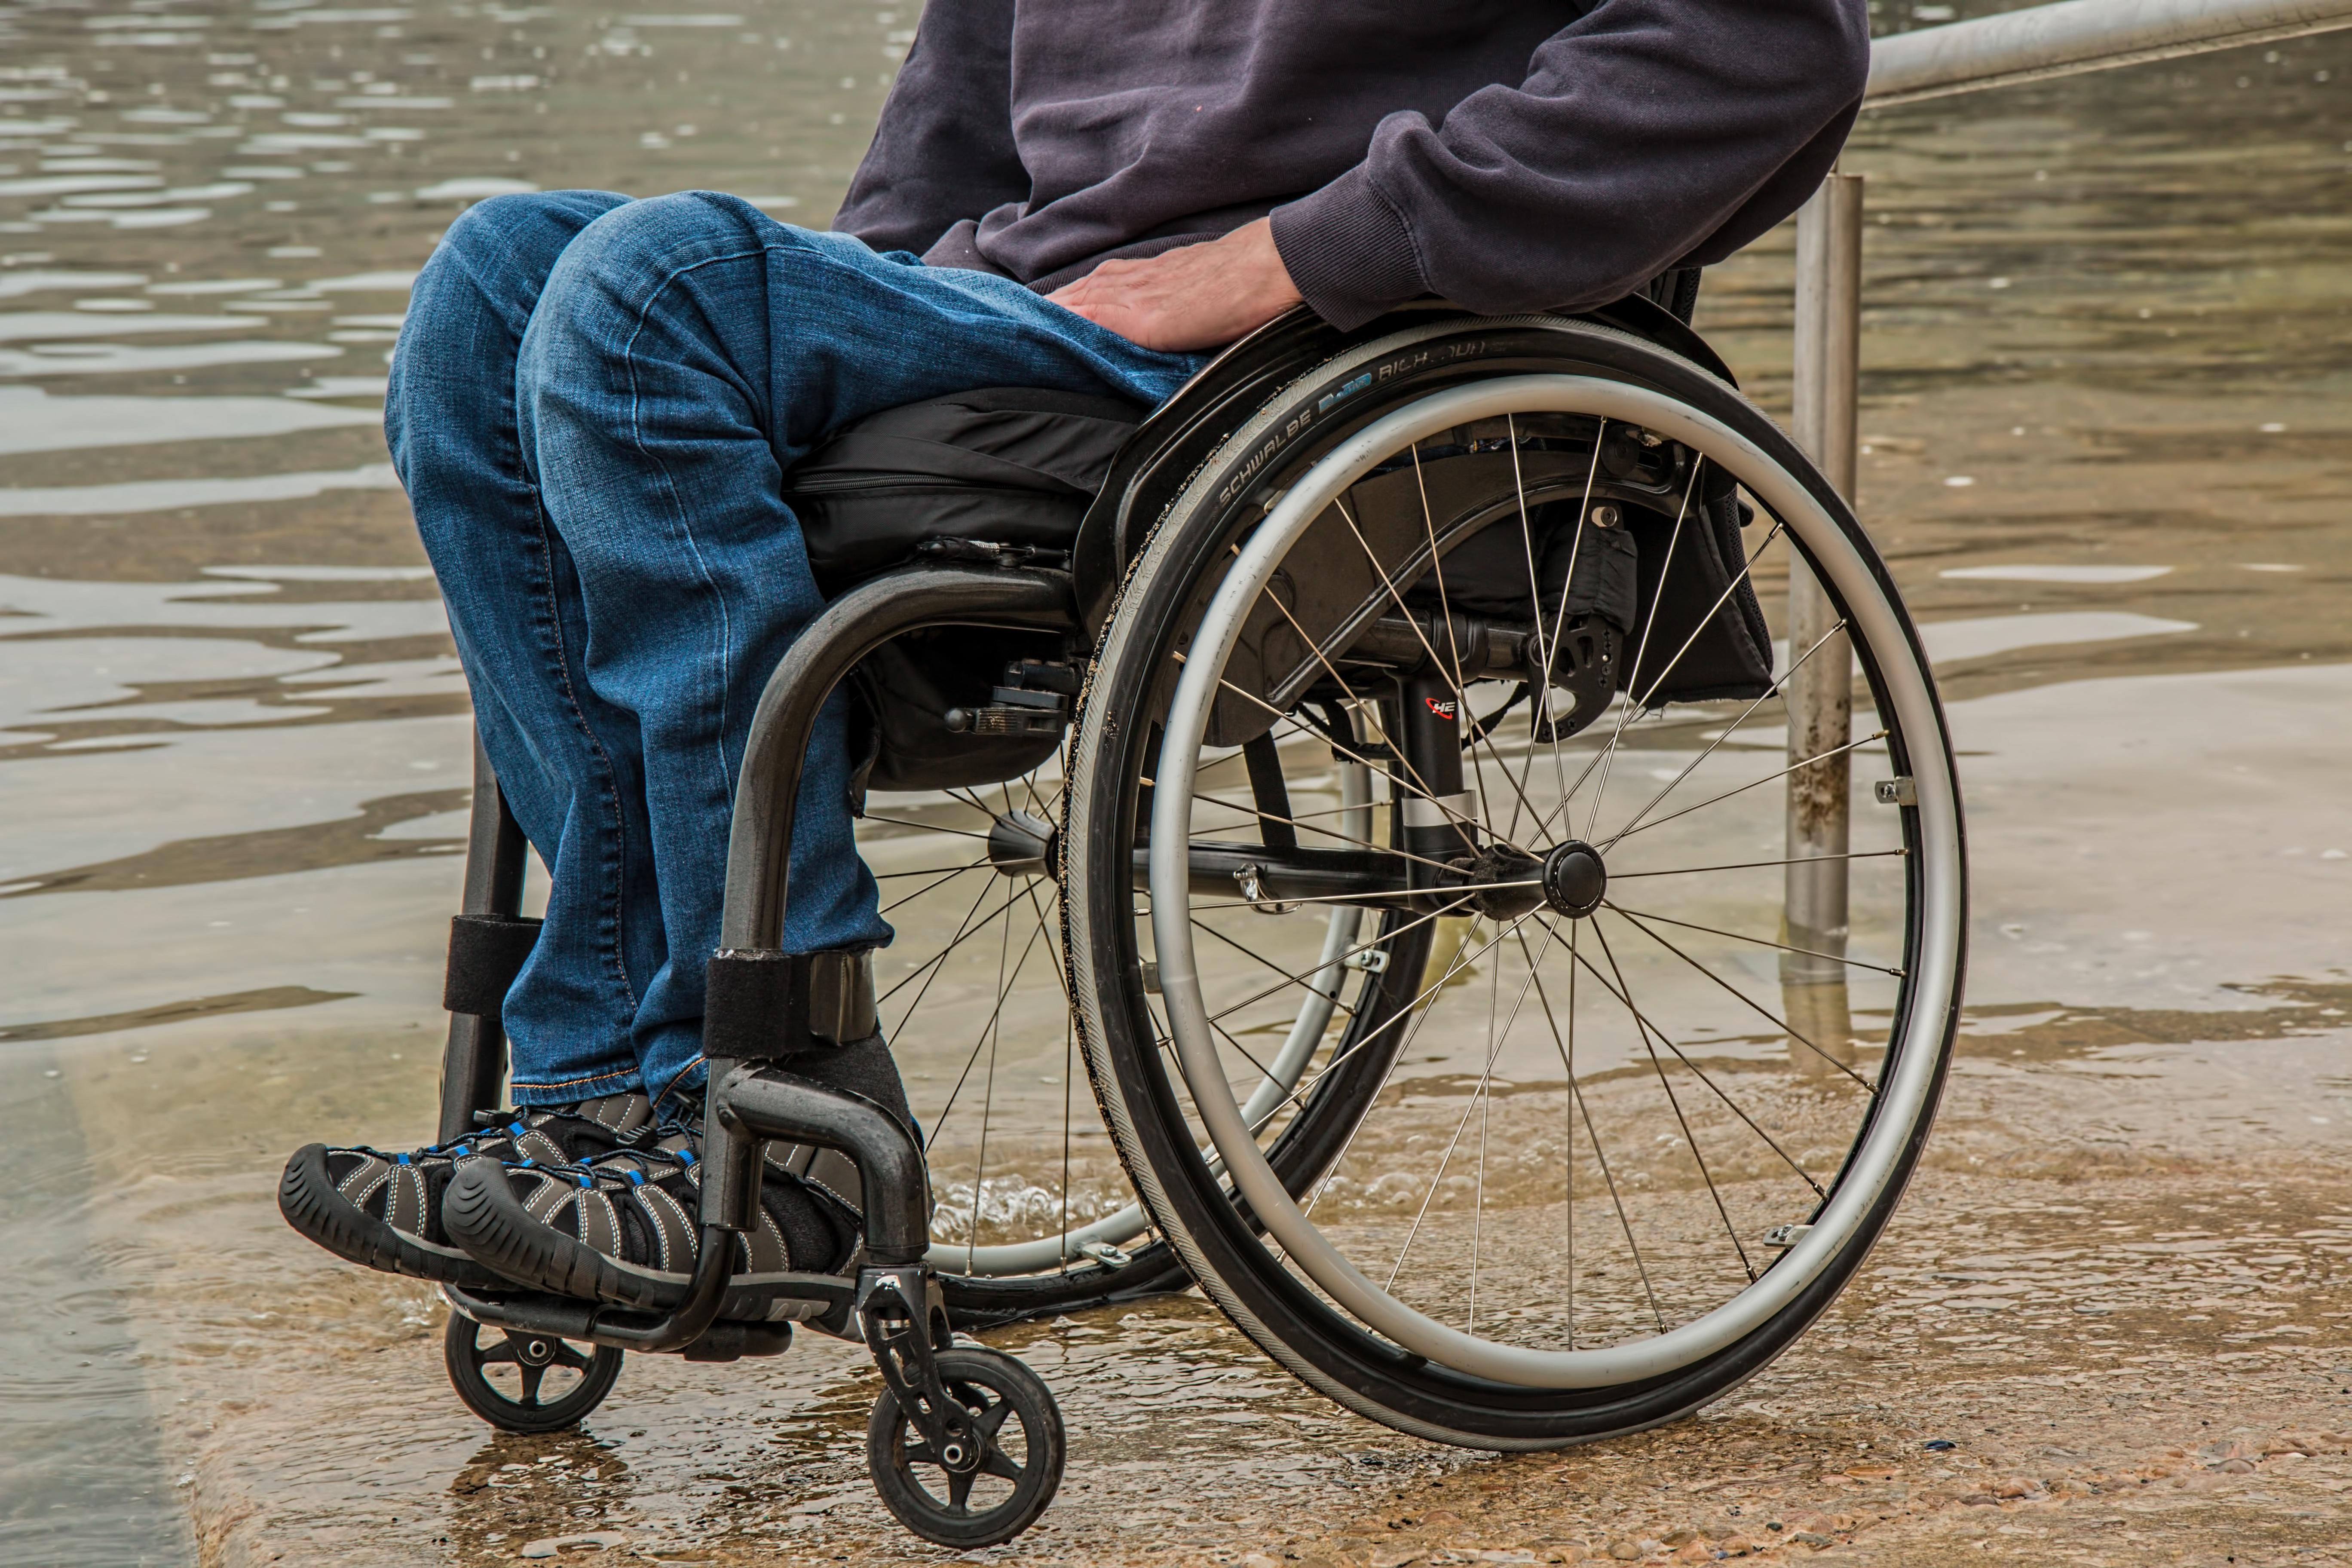 Physiotherapy rehabilitation paraplegic sexual health